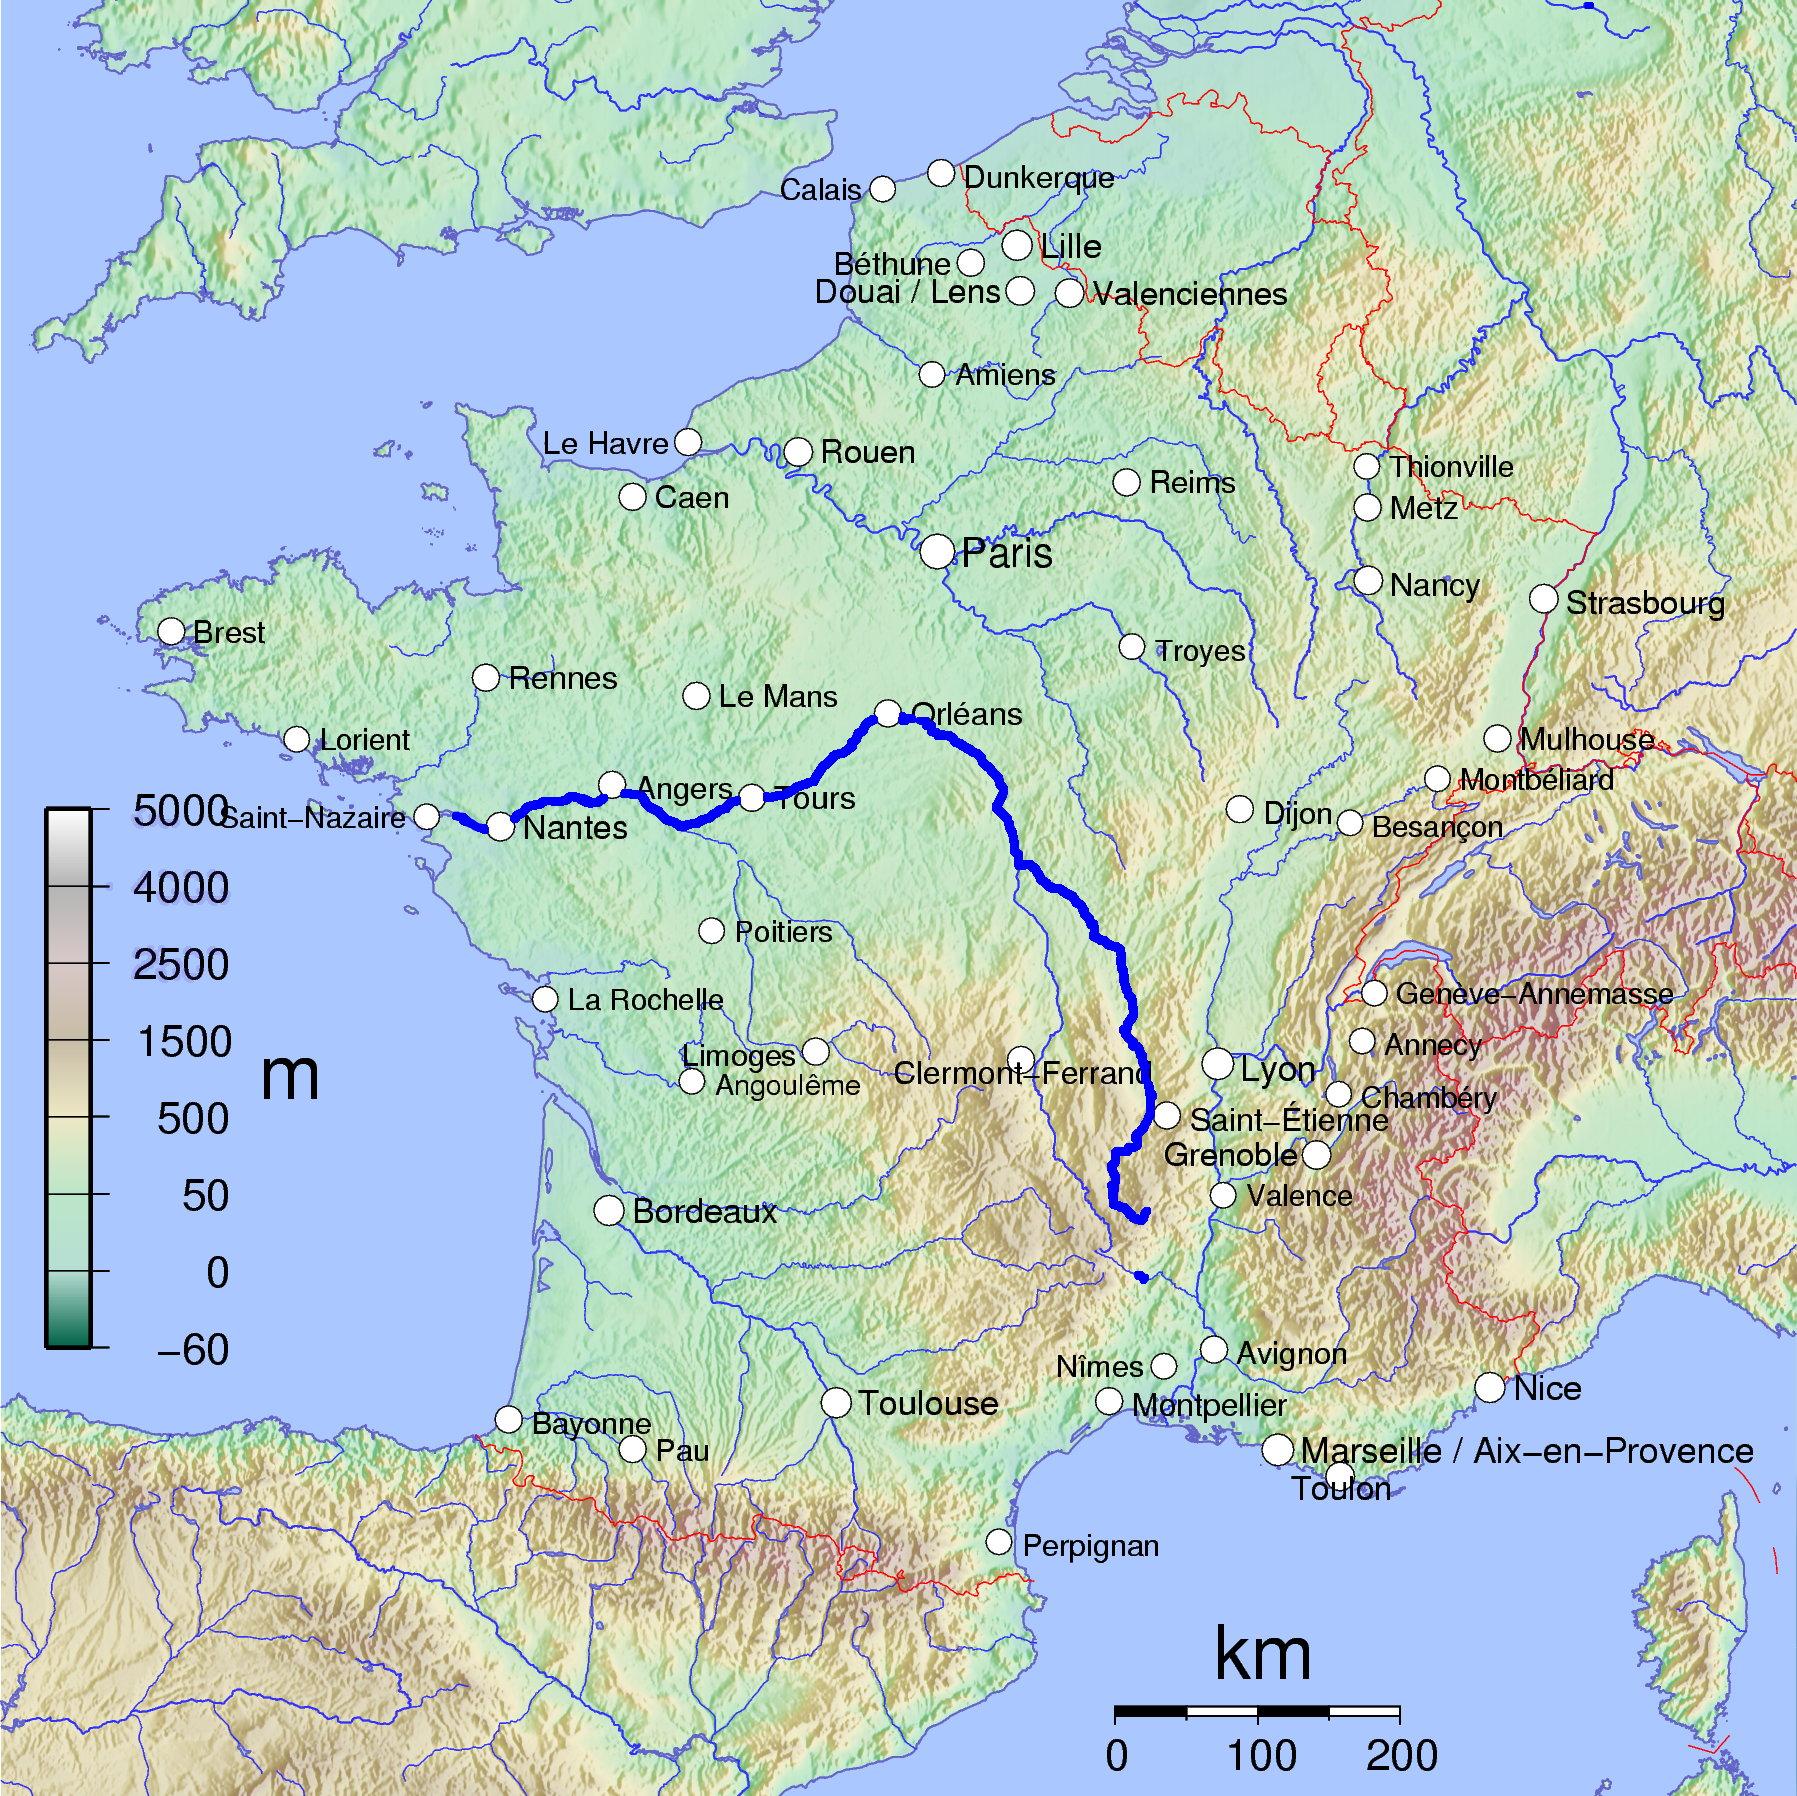 les bords de Loire France_map_with_Loire_highlighted